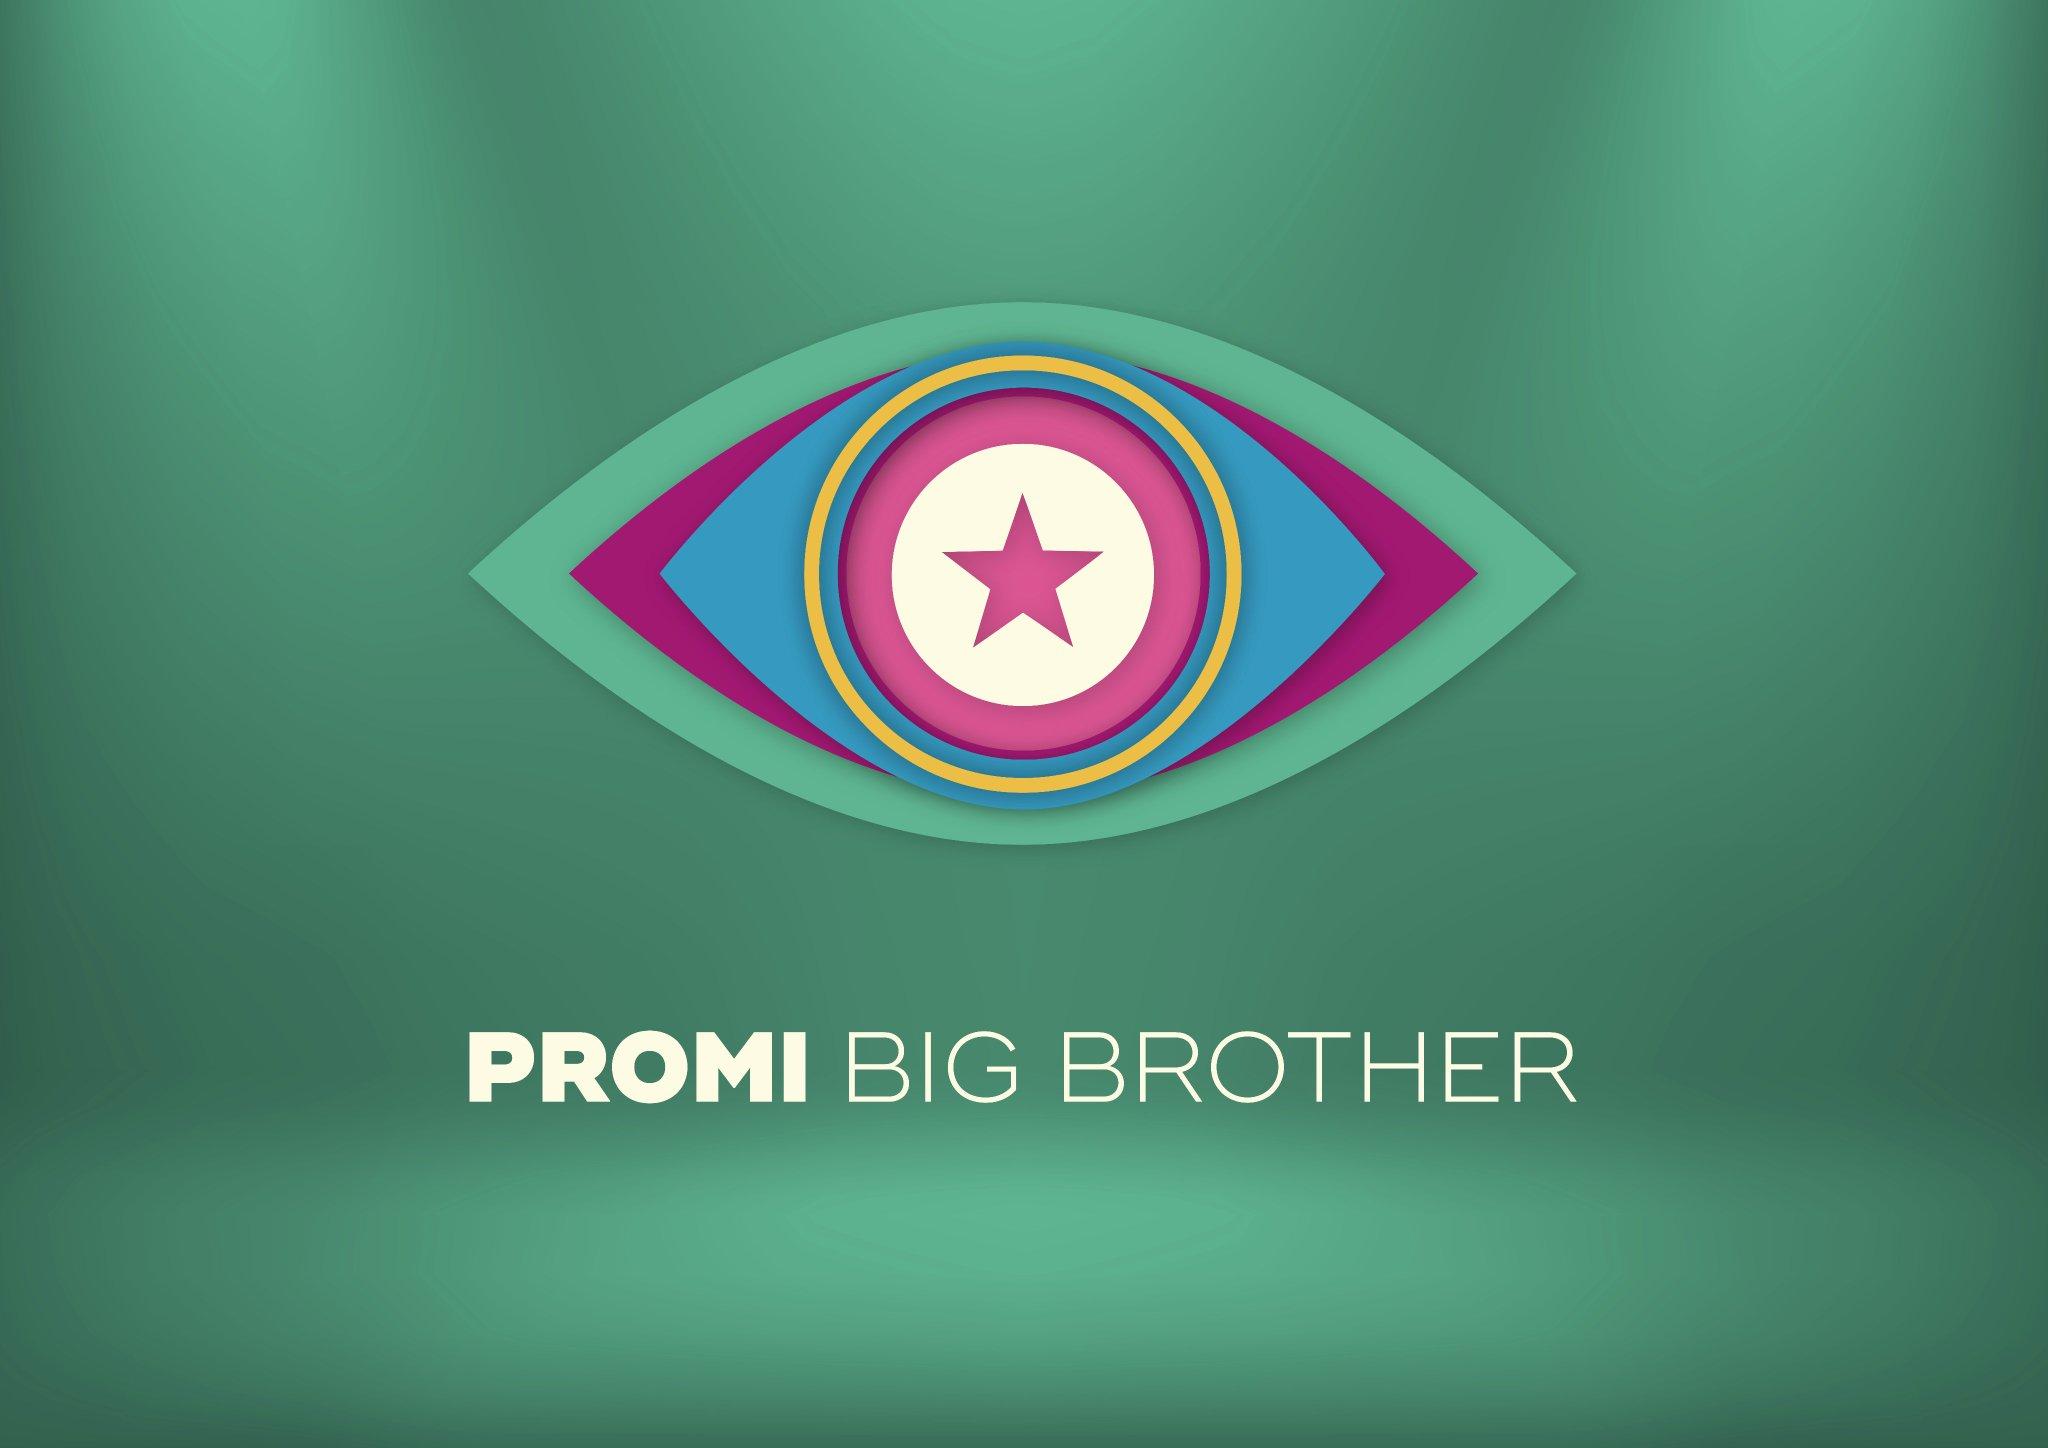 Promi Big Brother 2020